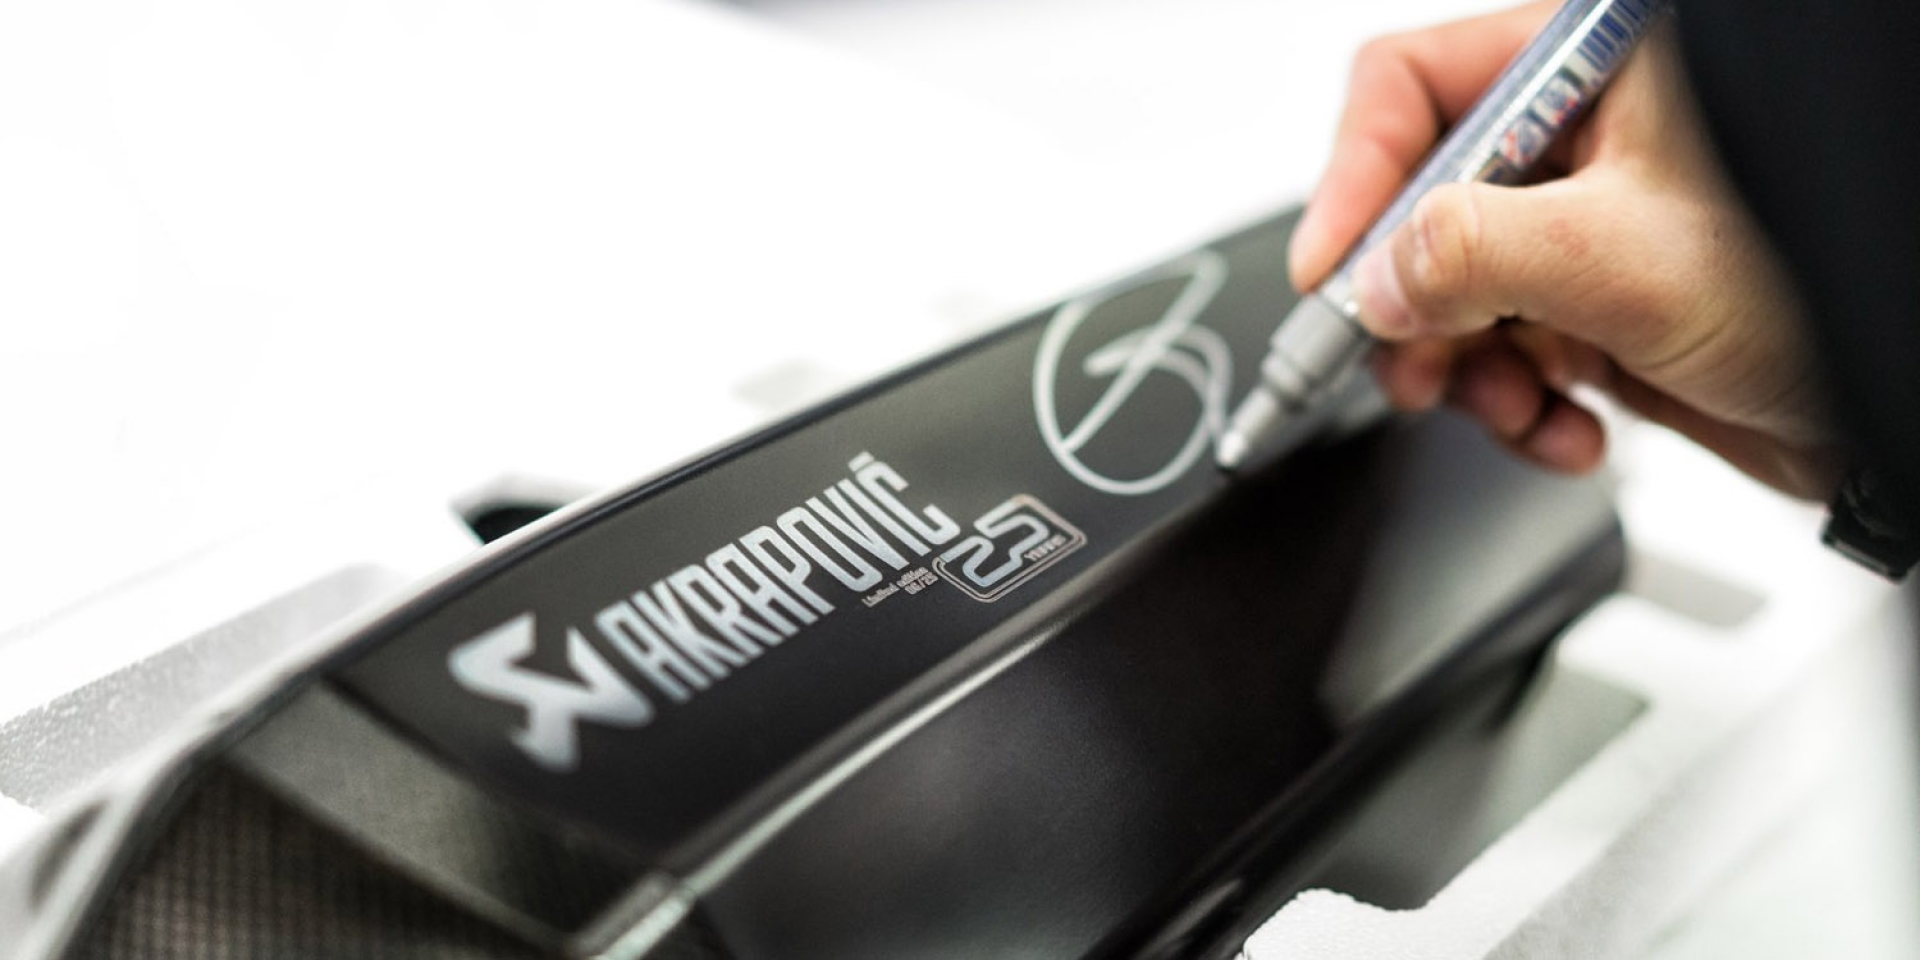 Akrapovič排氣管 25周年紀念版。頂尖車手加持更添收藏價值